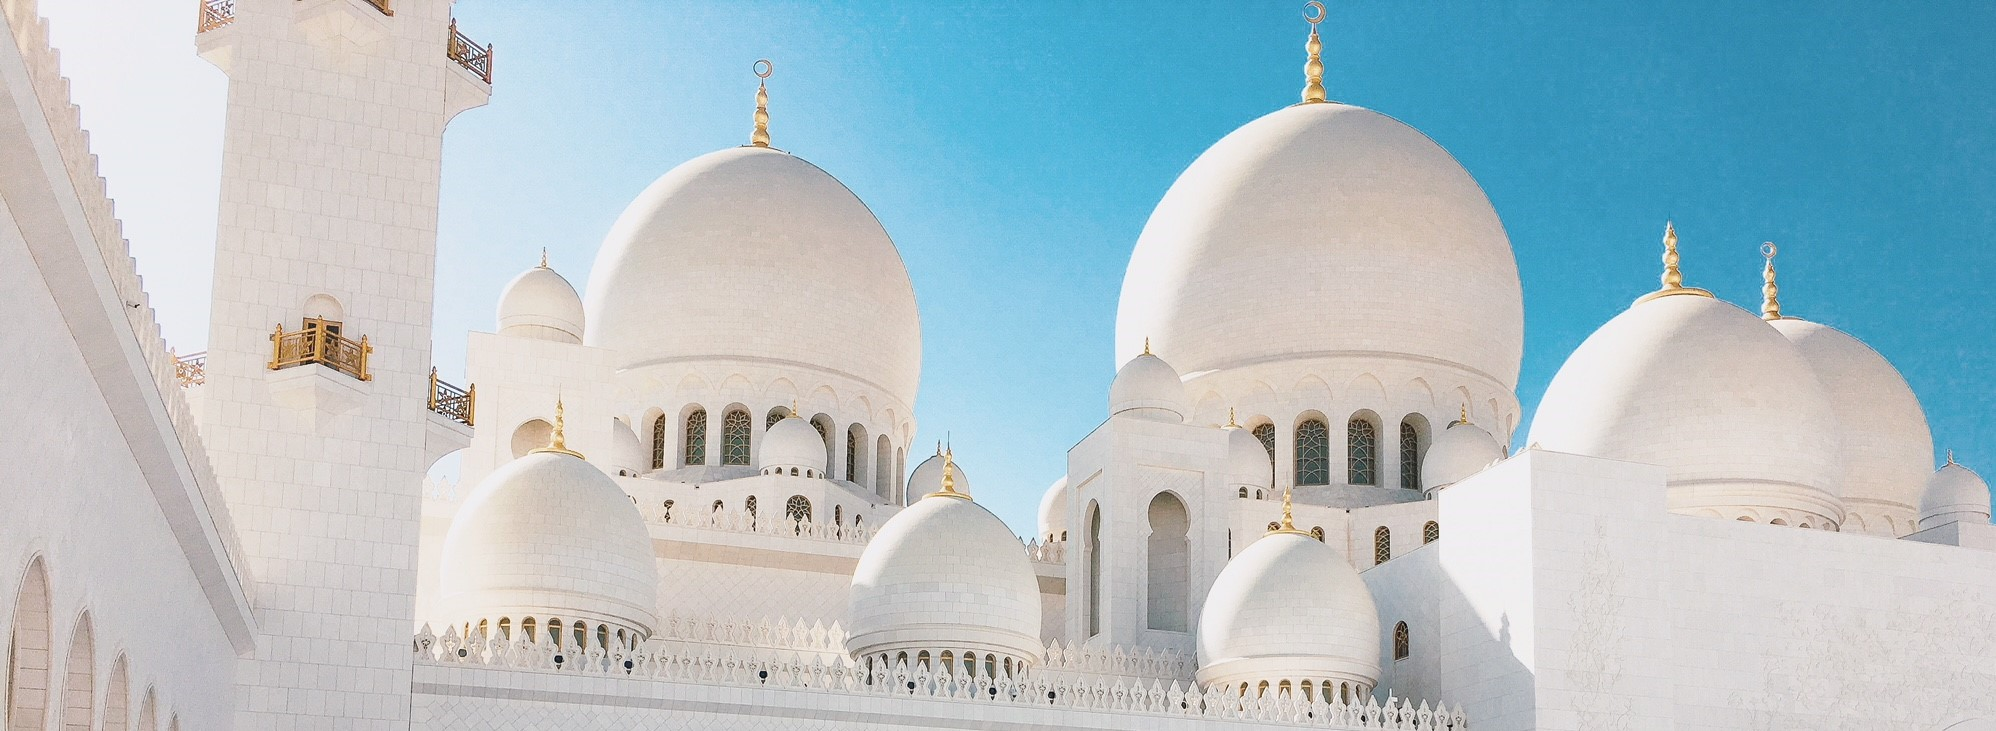 Abu Dhabi in 1 giorno, fra tradizione e modernità